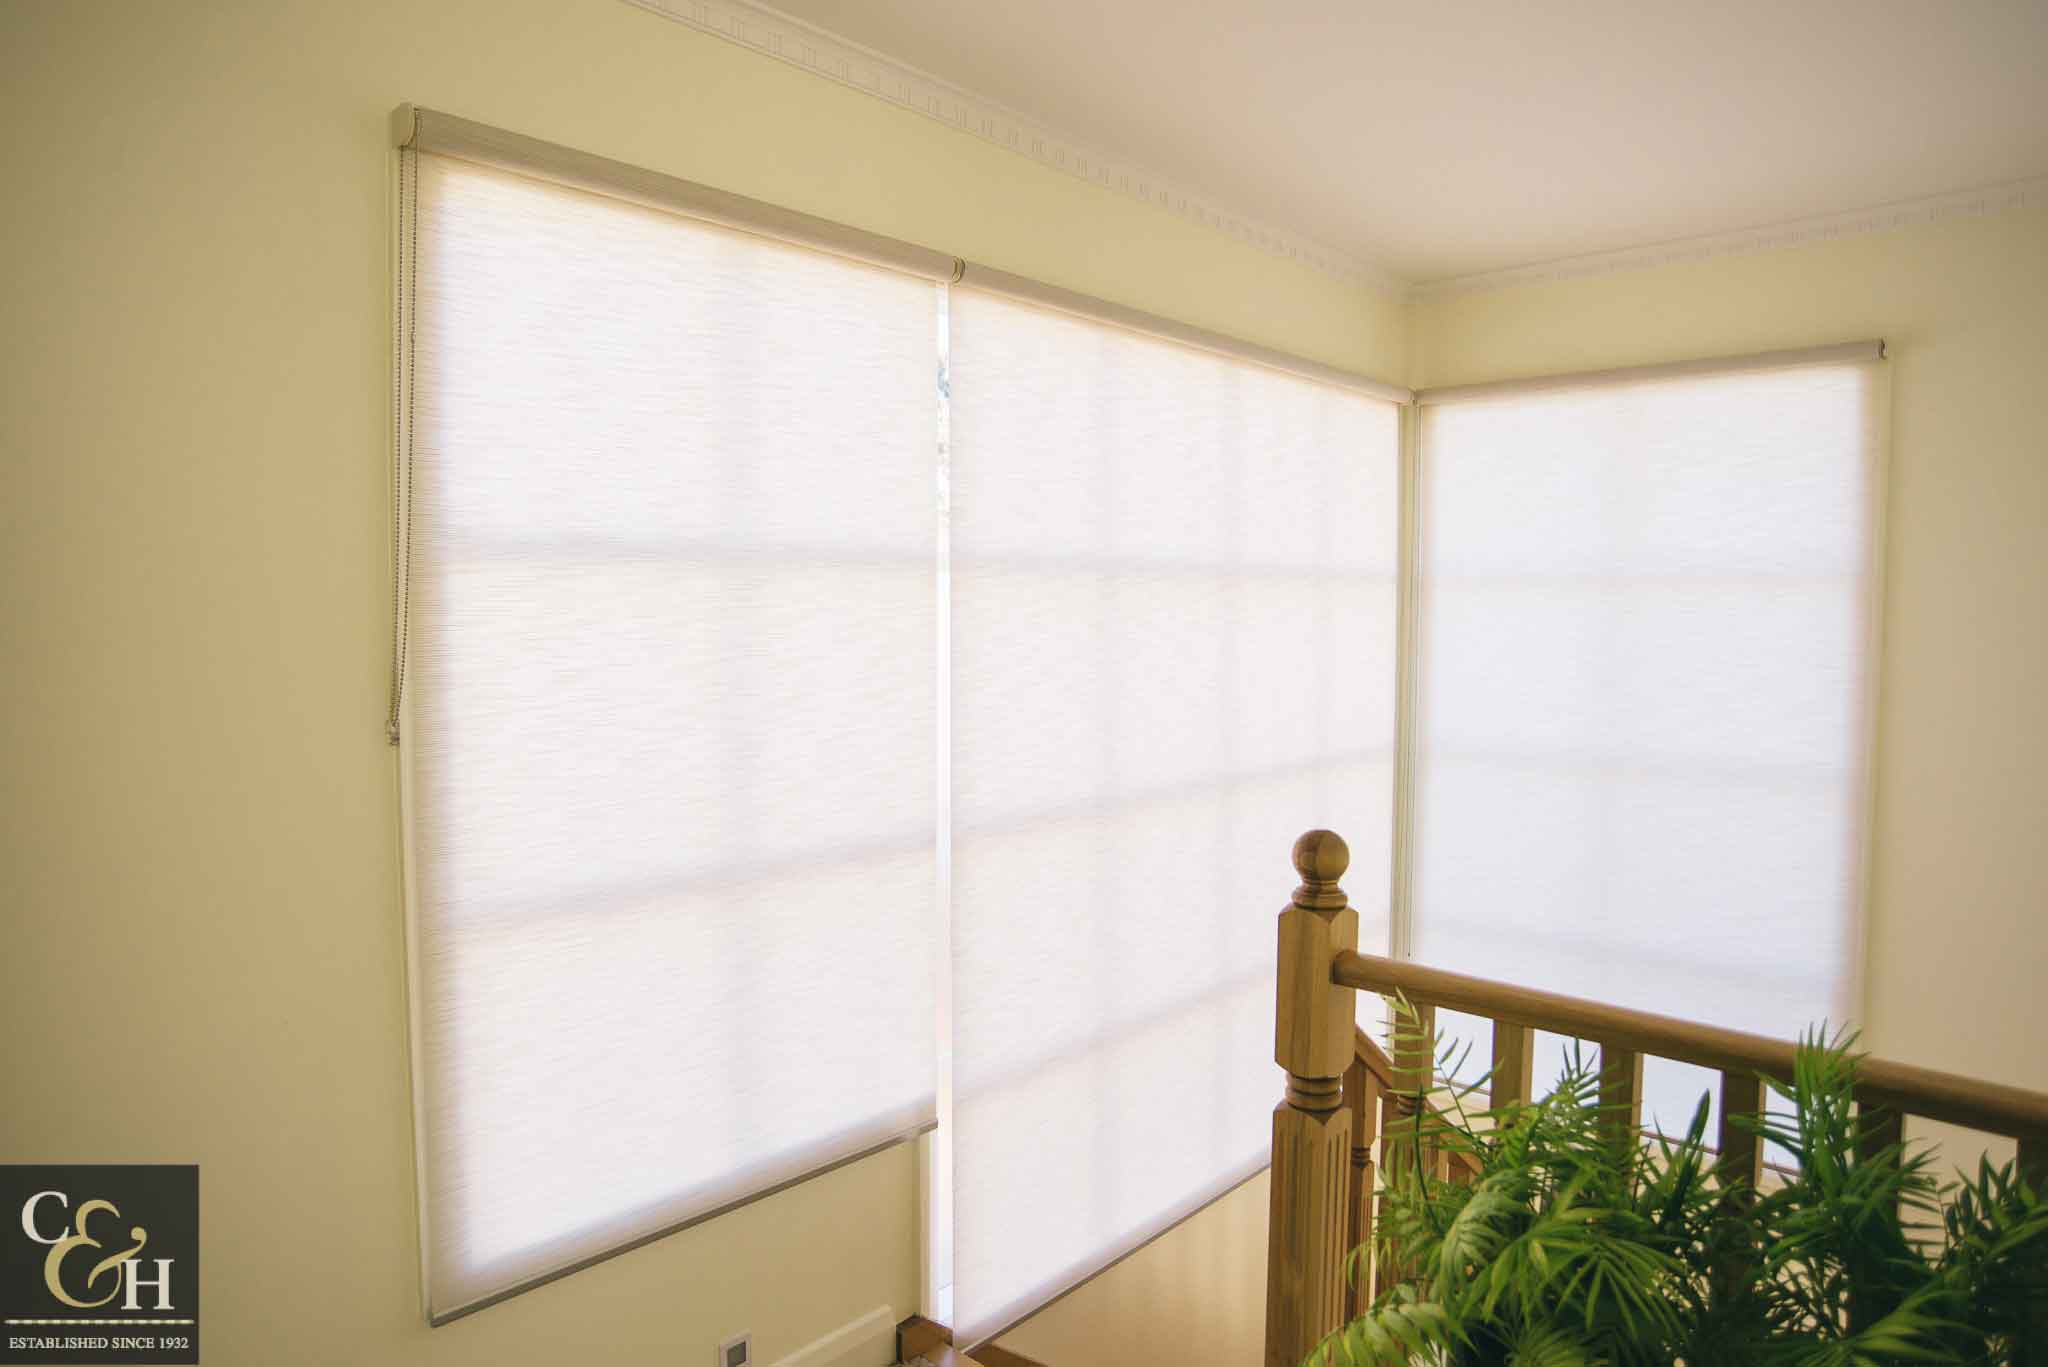 Screen-Roller-Blinds-46 outside an apartment